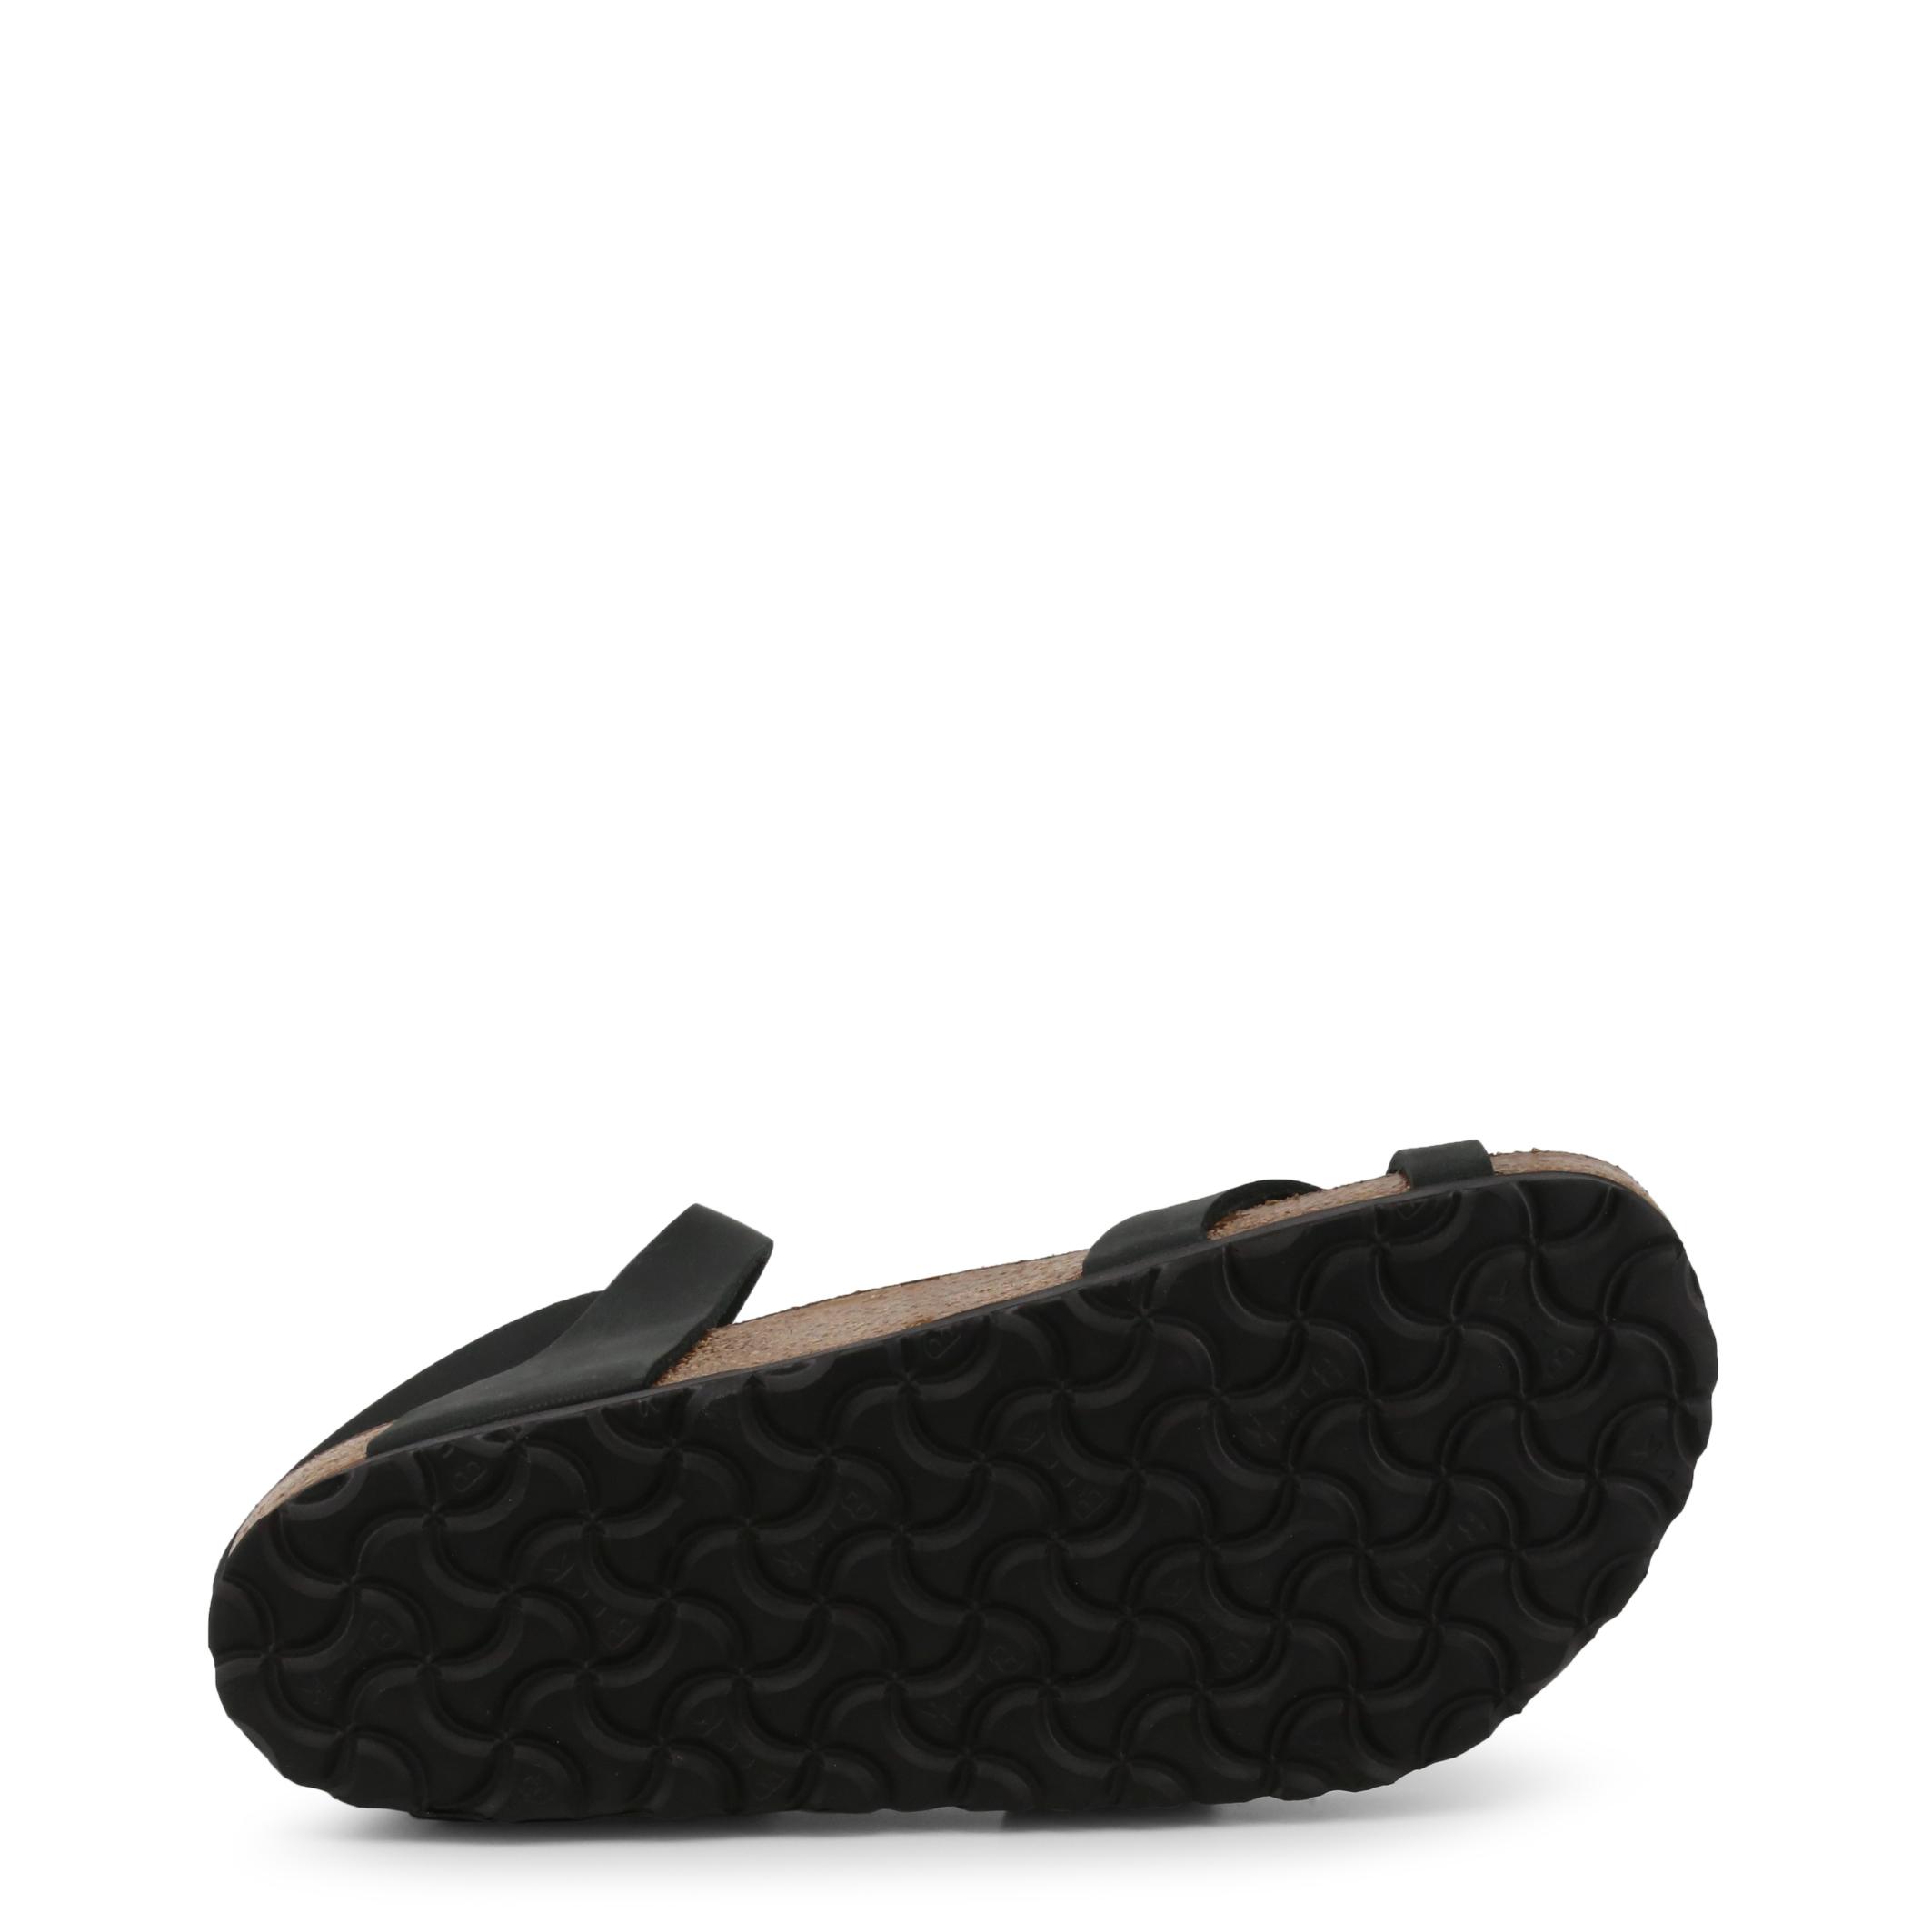 Tongs / Mules  Birkenstock YARA_OILED-LEATHER black